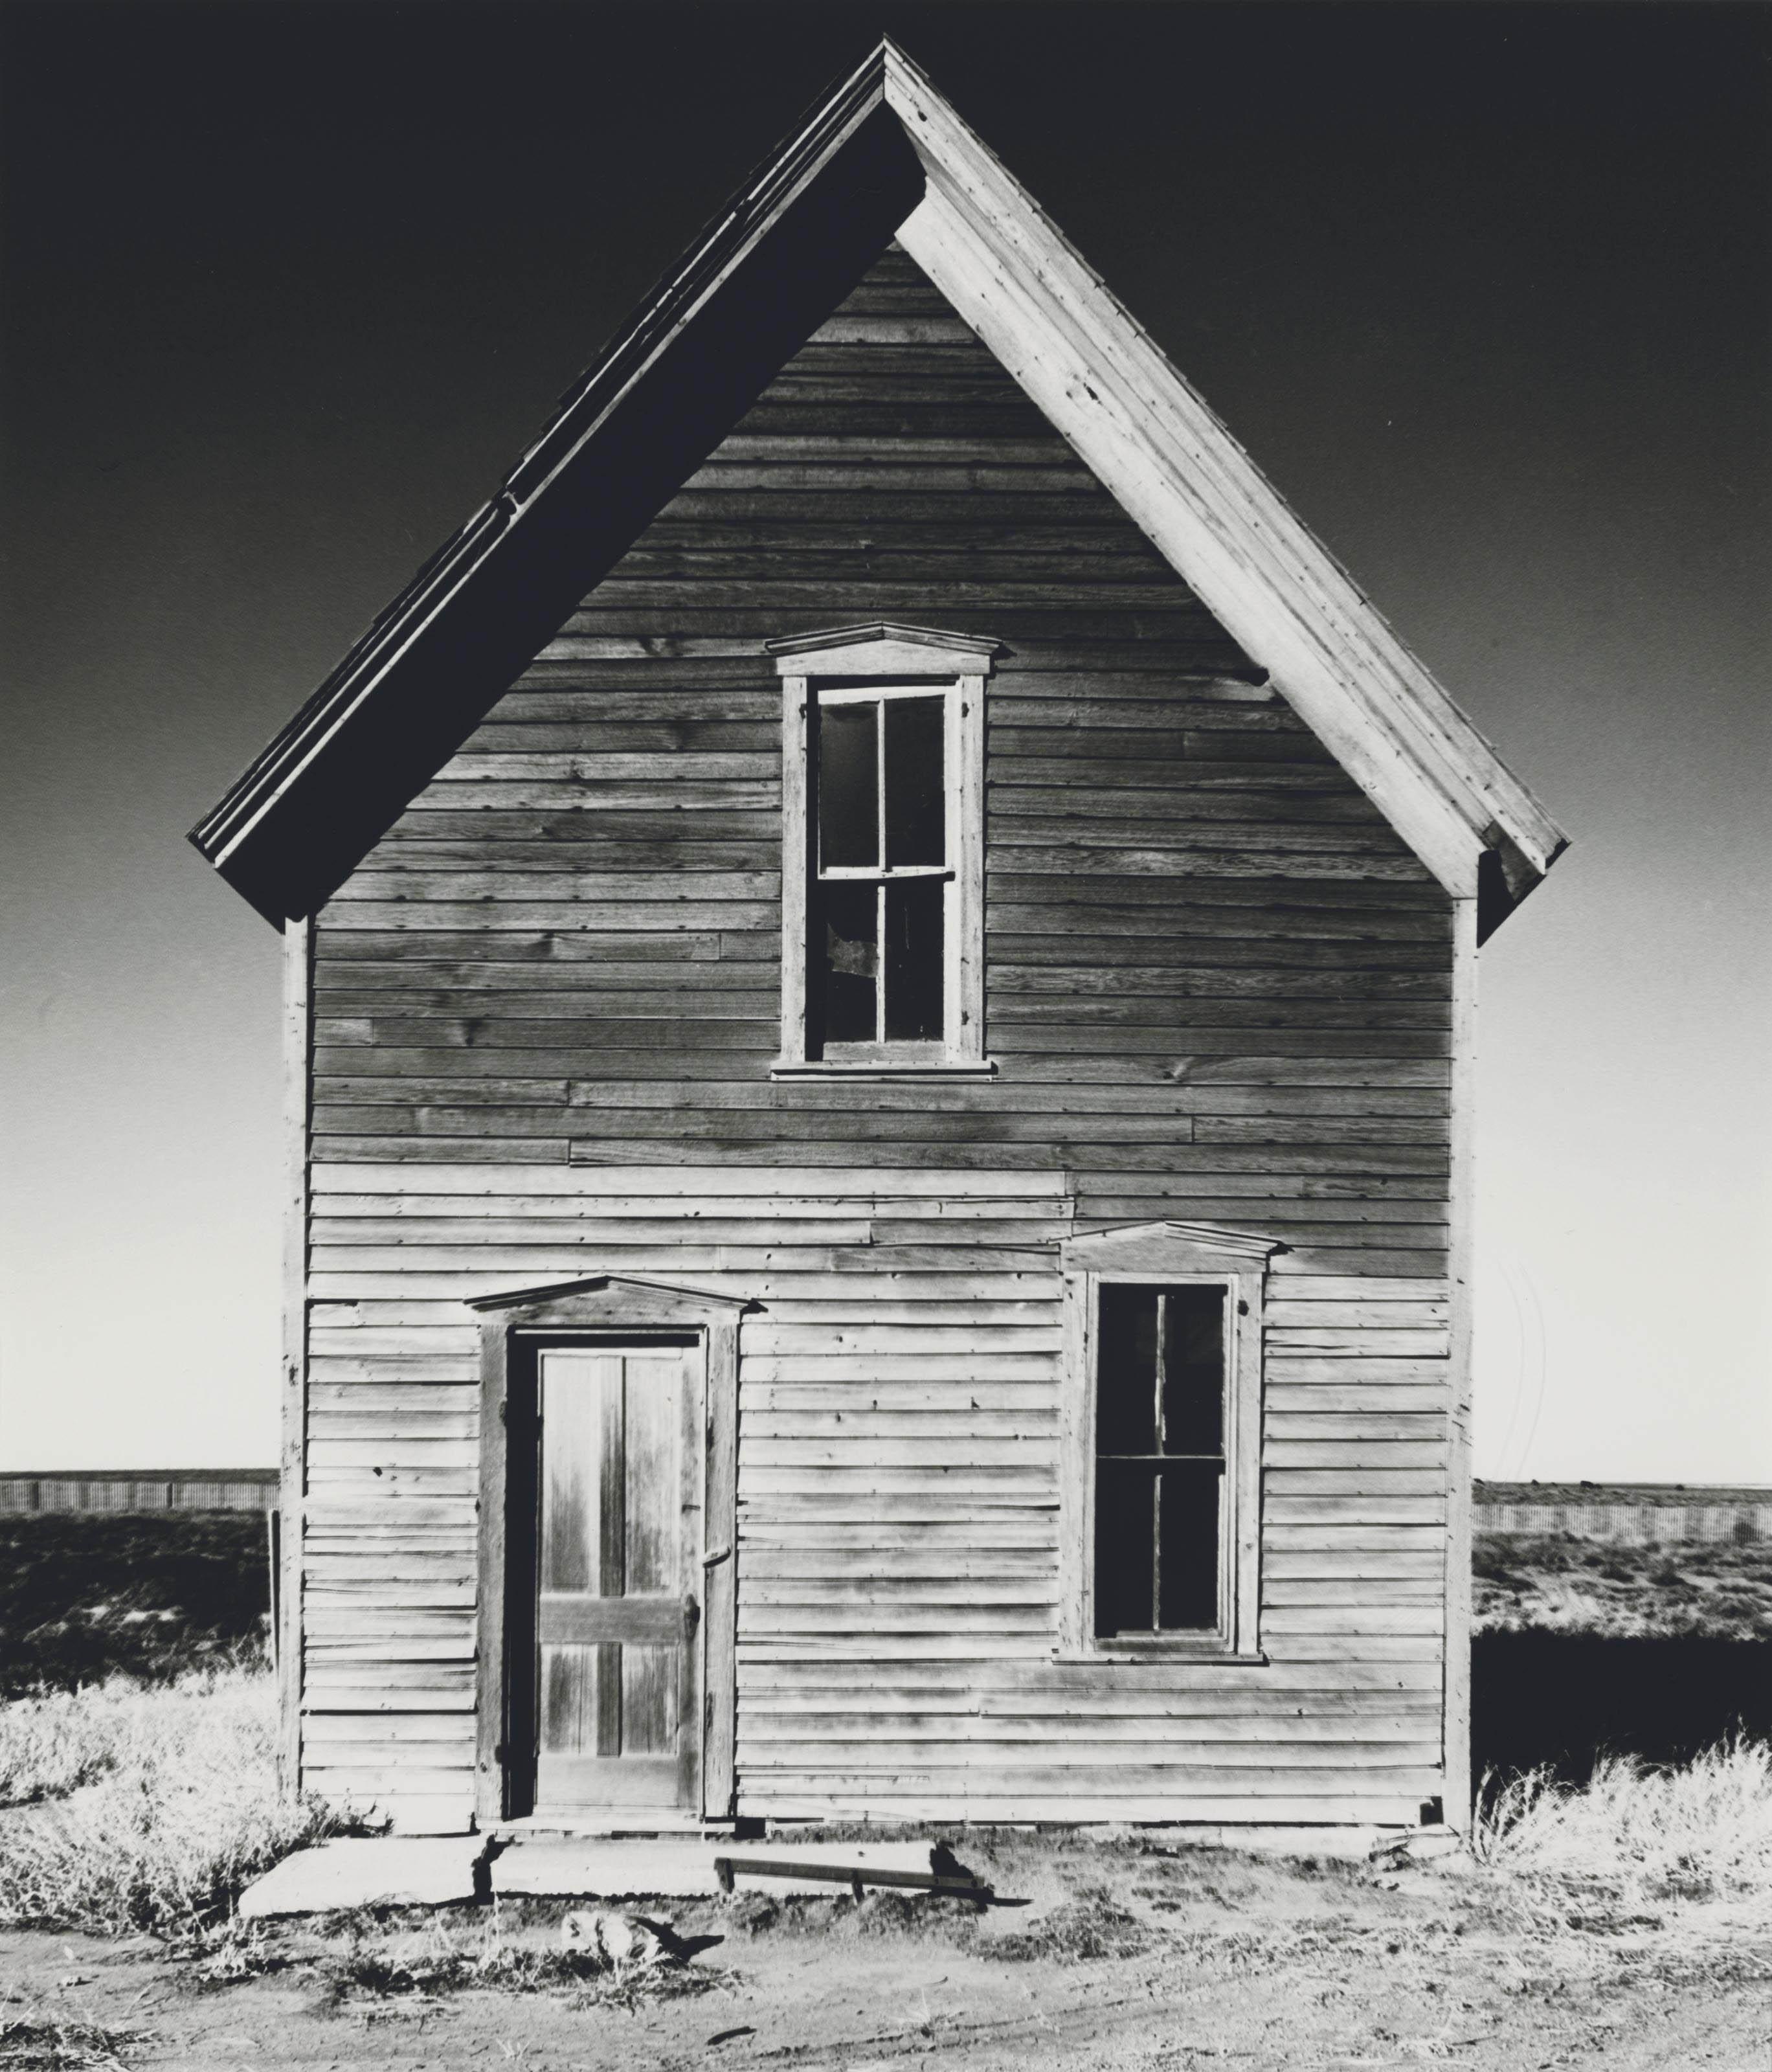 Farmhouse, near McCook, Nebraska, 1940